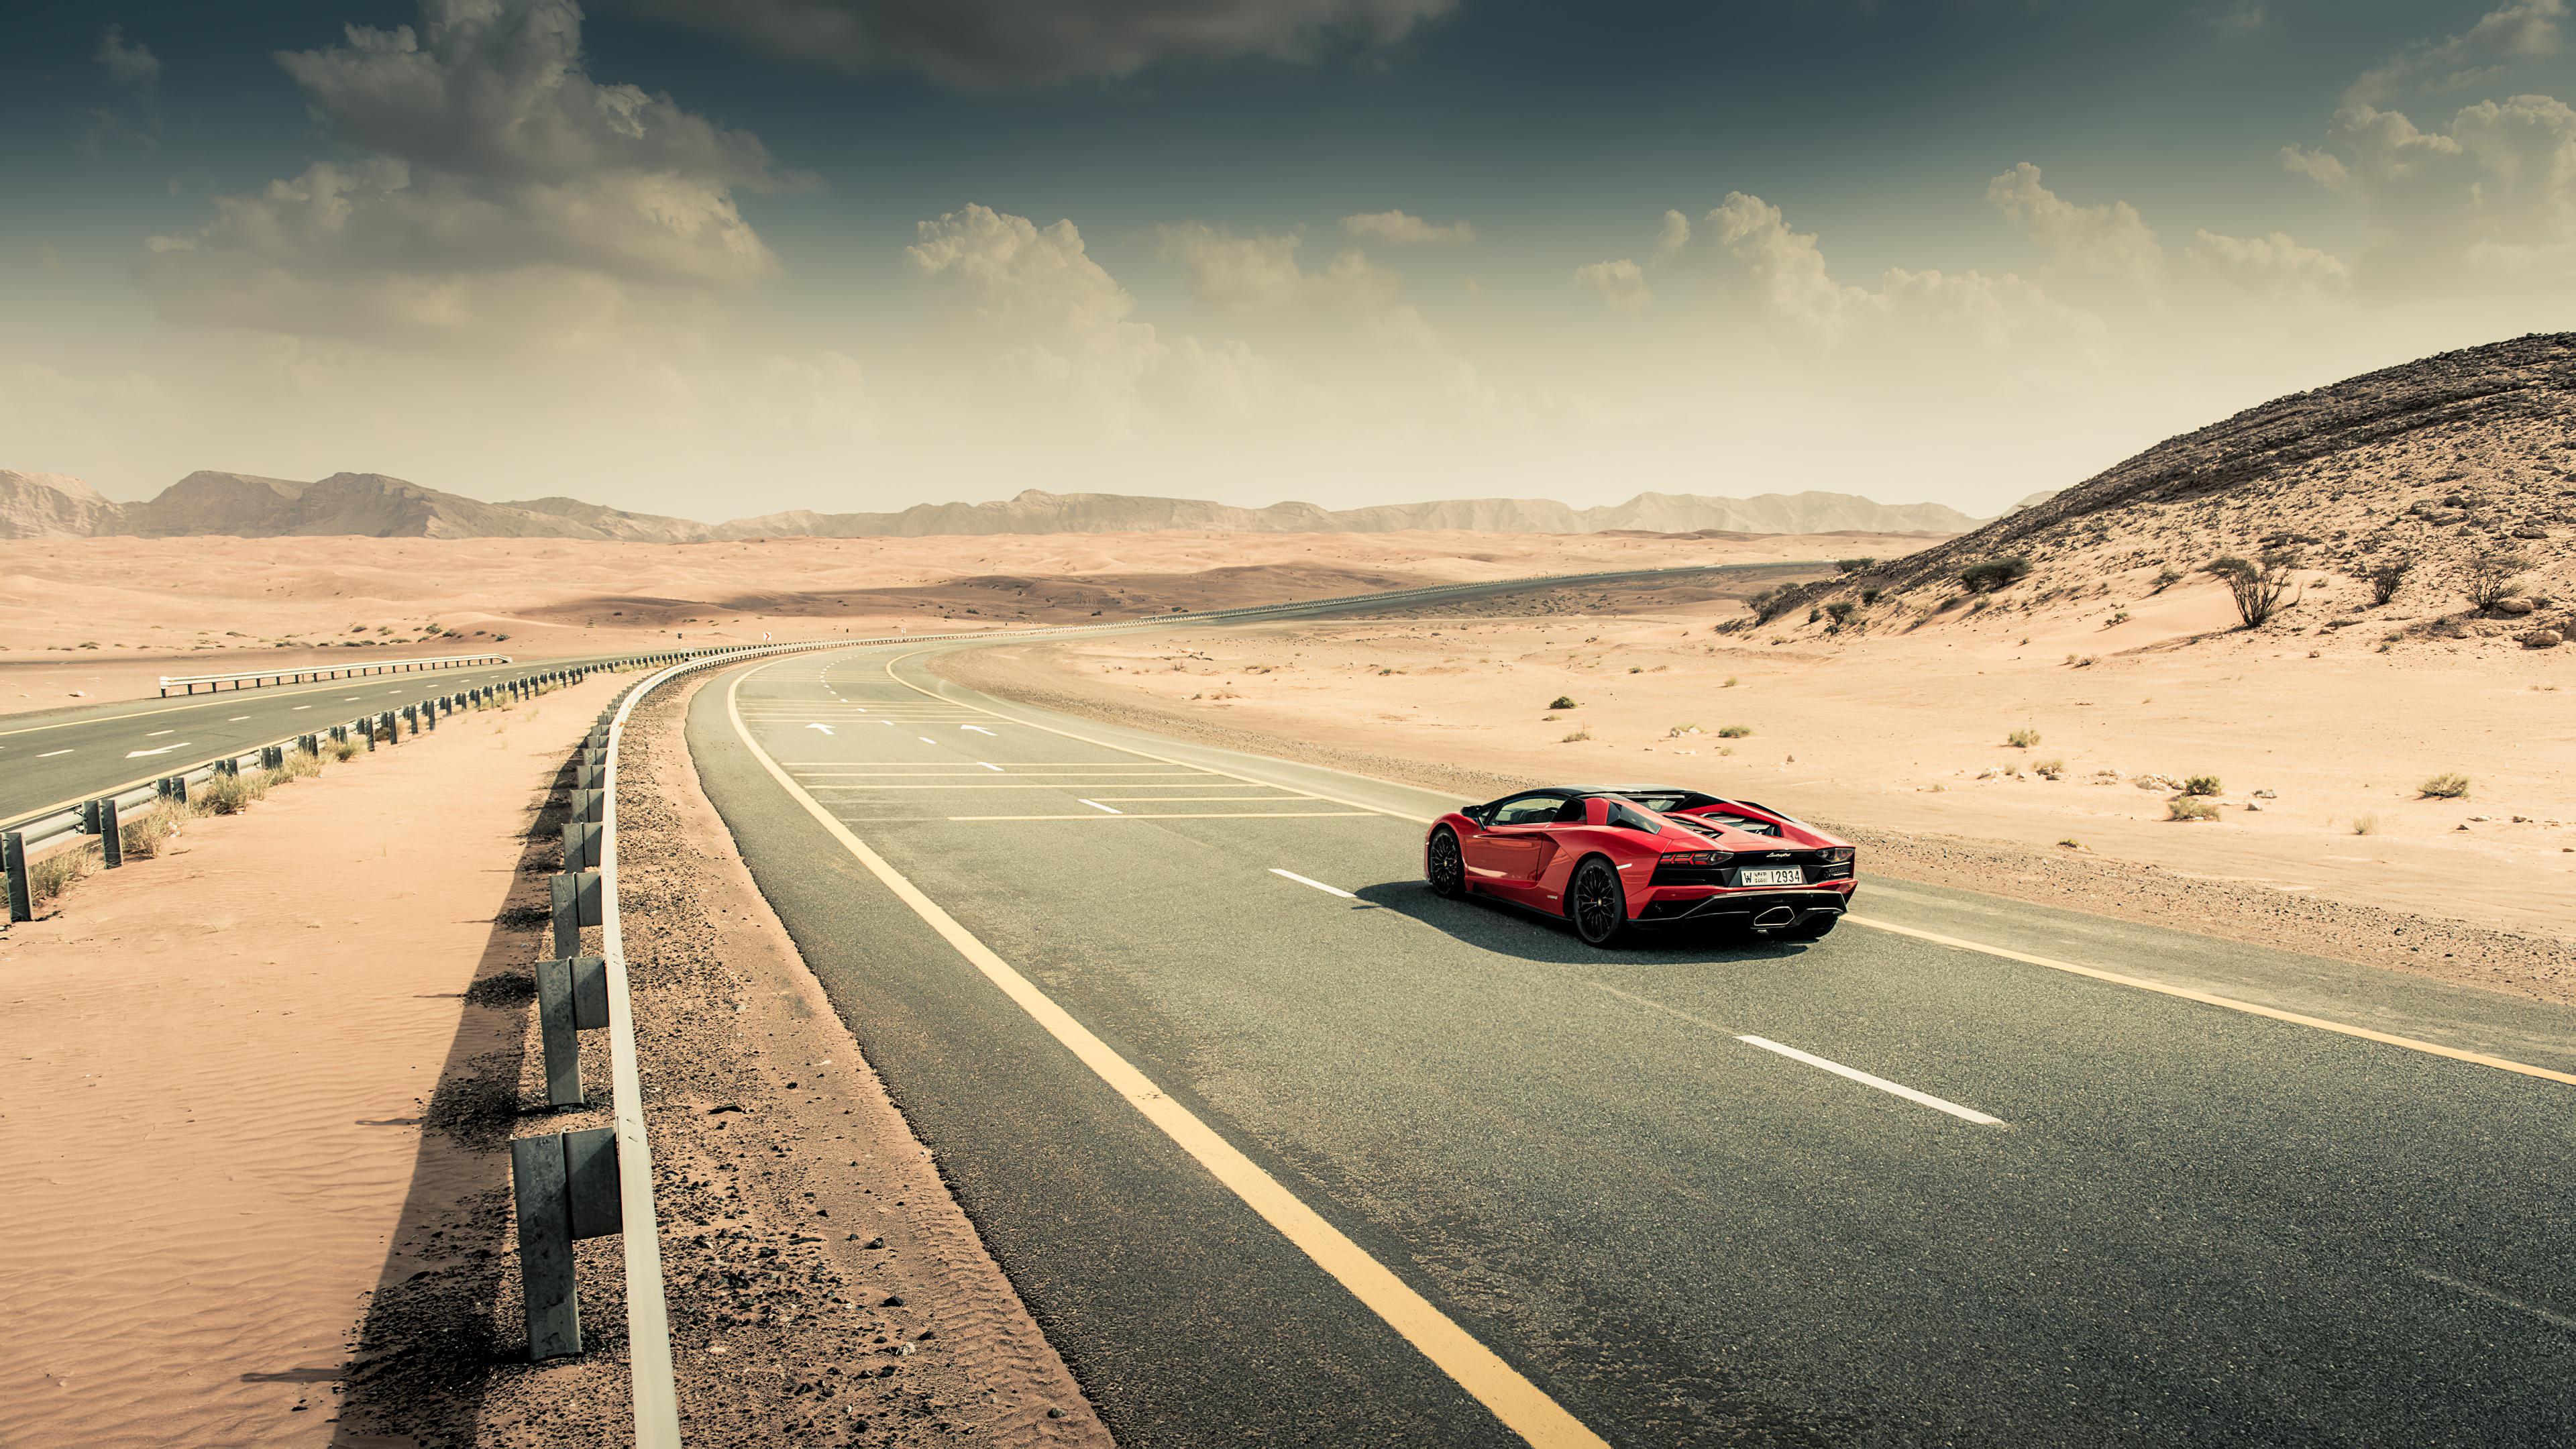 2020 lamborghini aventador s roadster 1579649267 - 2020 Lamborghini Aventador S Roadster -